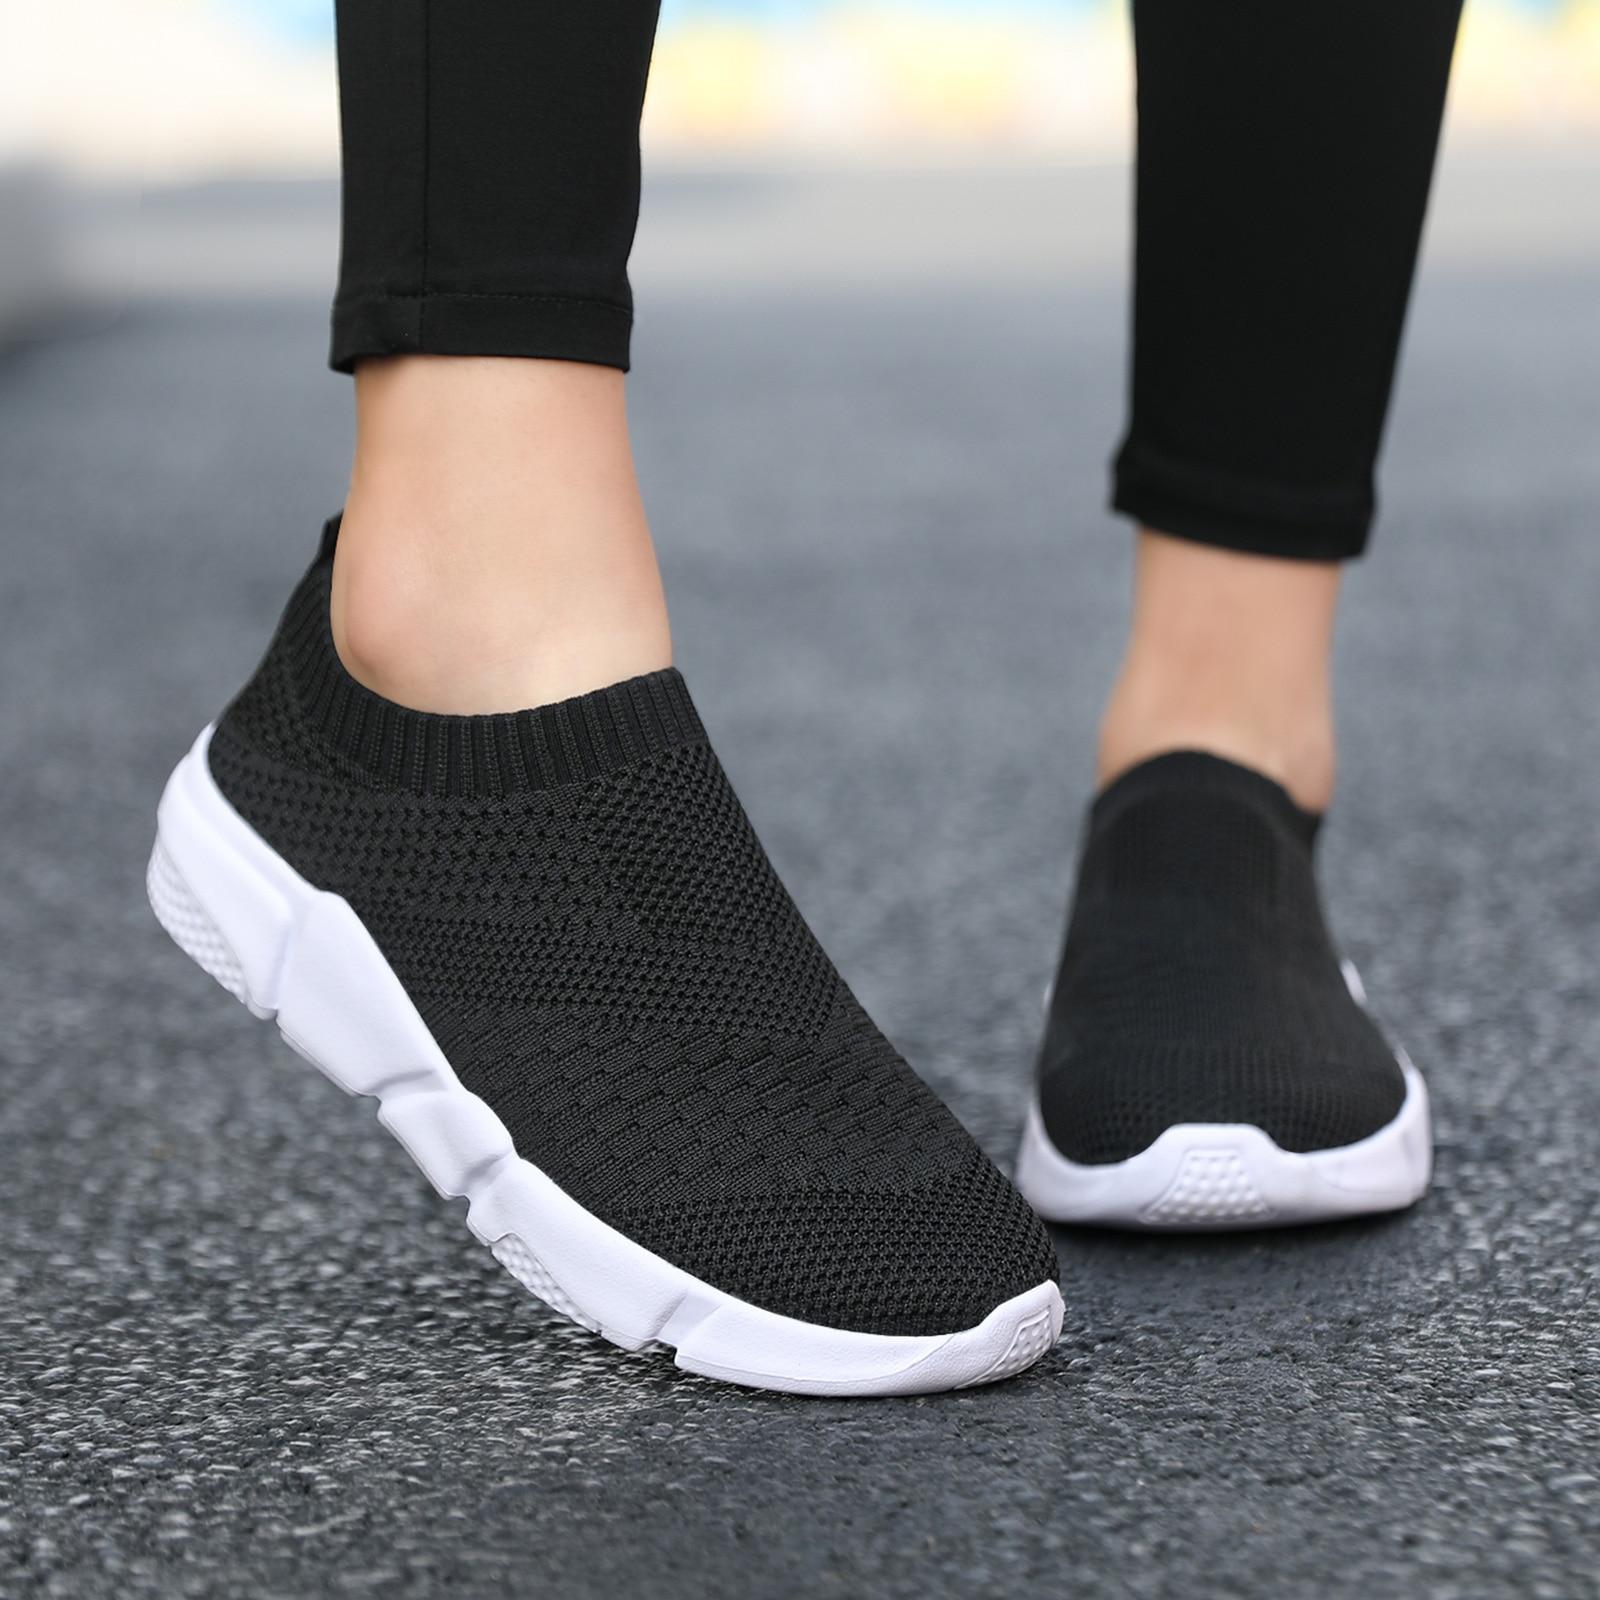 Women Flat Slip on Black Shoes Woman Lightweight Walking Sock Sneakers Summer Casual Chaussures Femme Tenis Loafers Plus Size 42